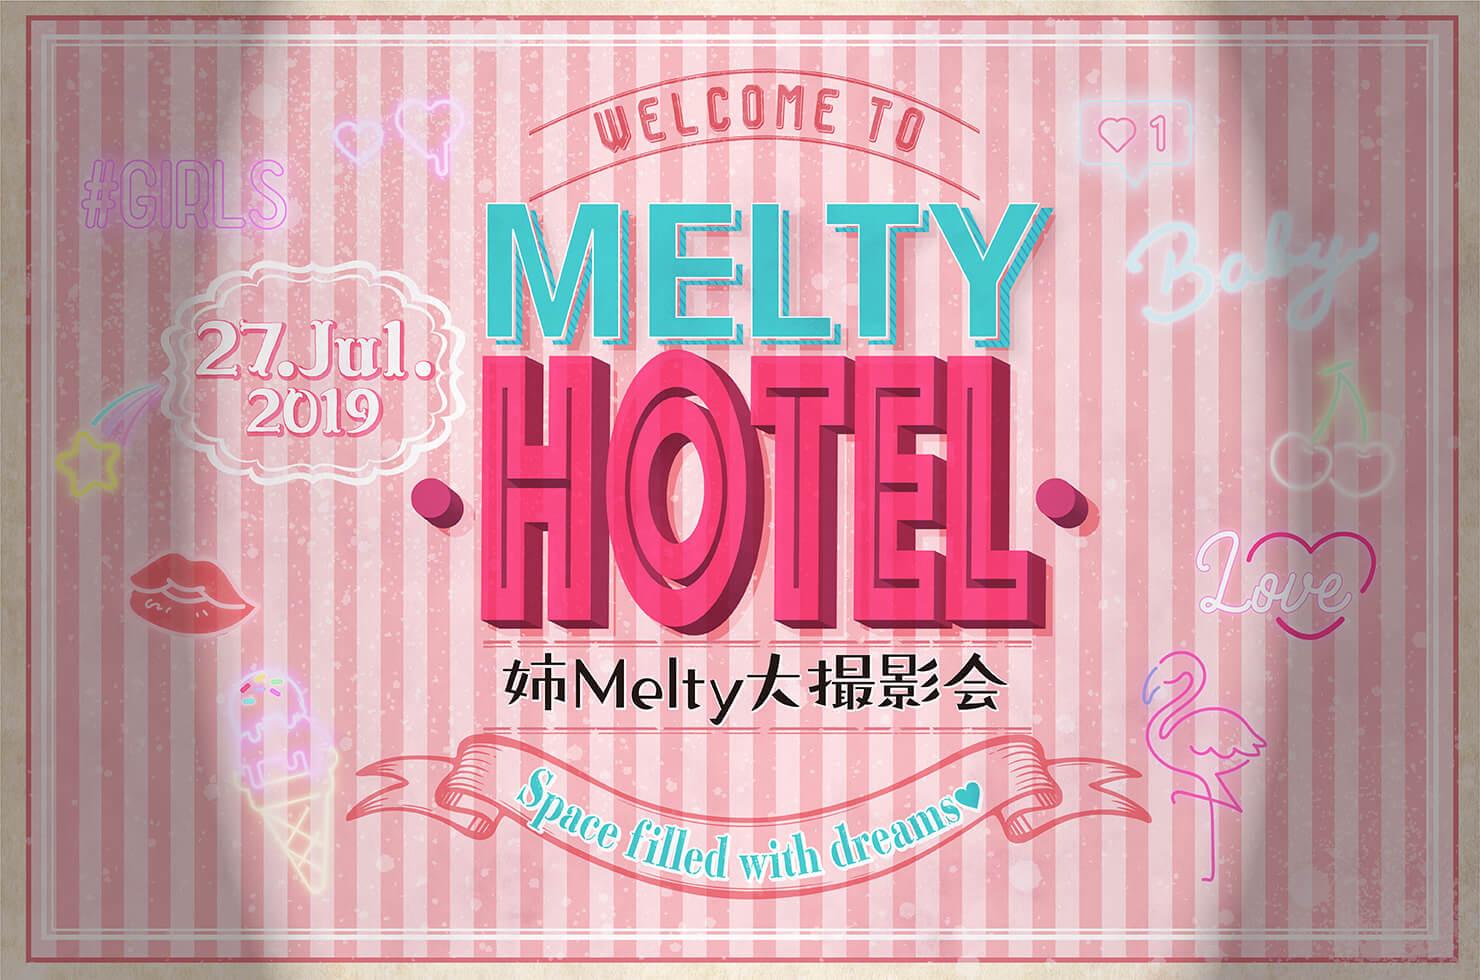 2019年7月27日(土)「Melty HOTEL 〜姉Melty大撮影会〜」